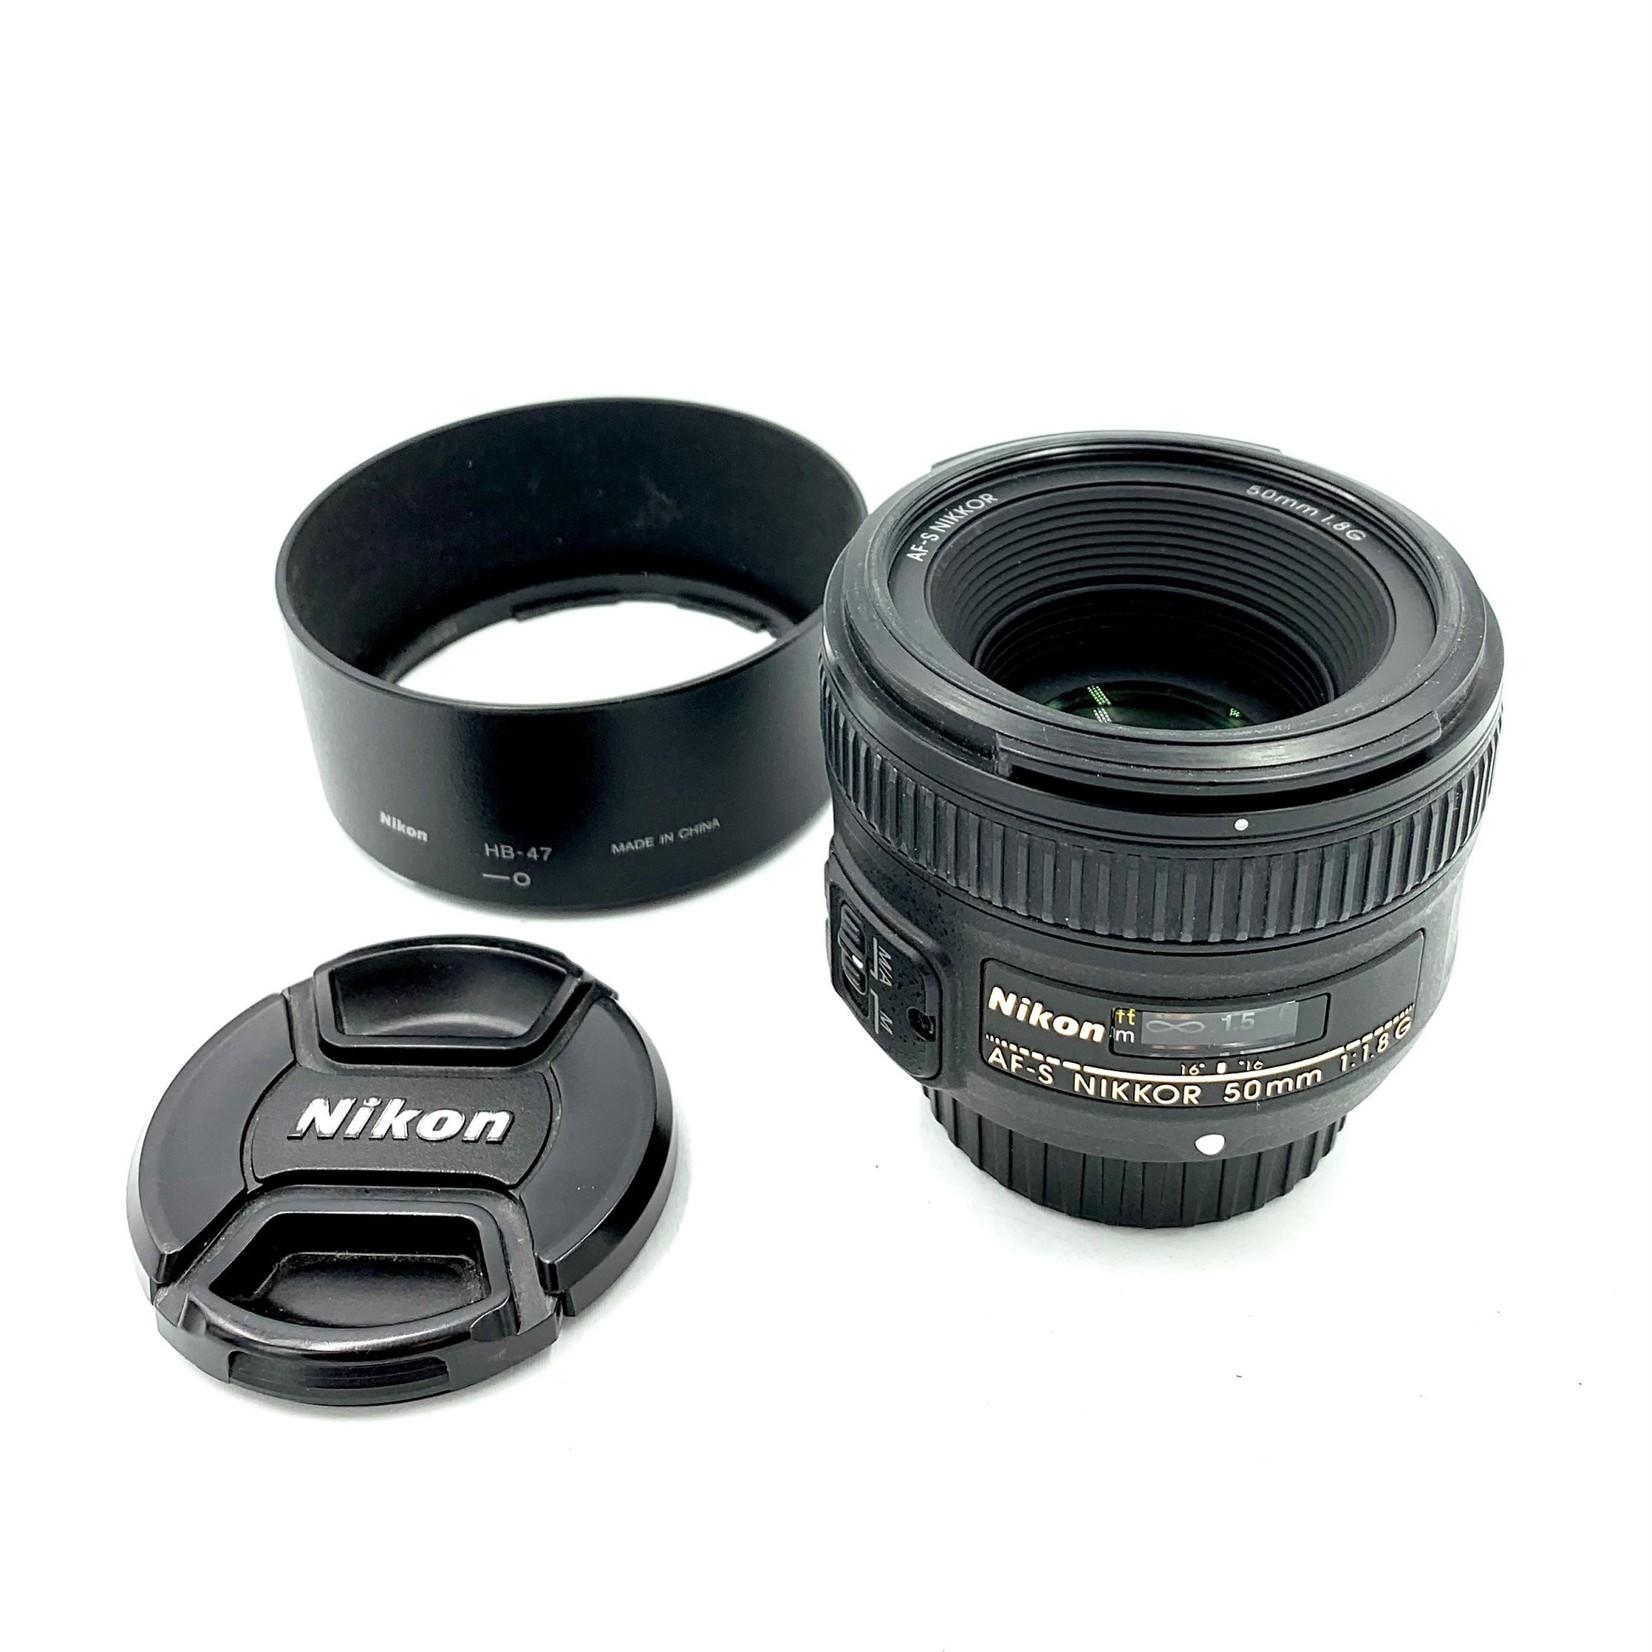 Nikon USED Nikon AF-S 50mm f/1.8 G